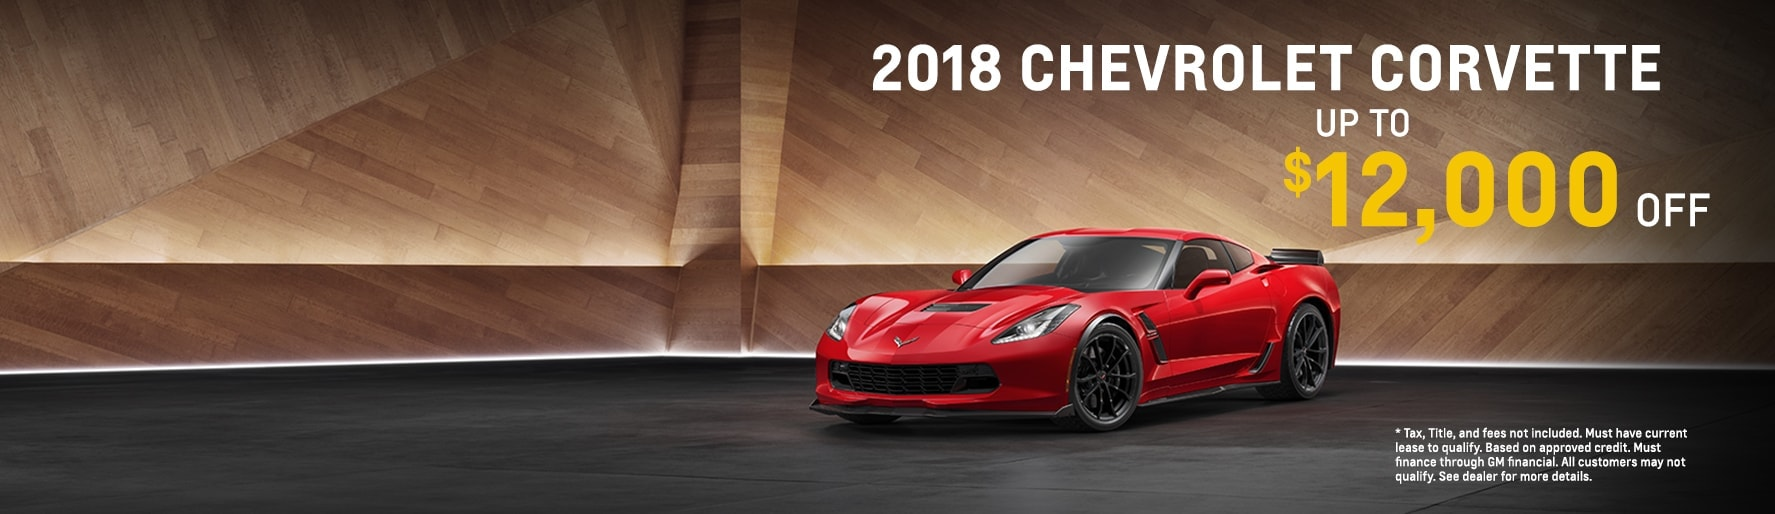 Jake Sweeney Tri County >> Jake Sweeney Chevy® | New and Used Cincinnati Chevrolet Dealer